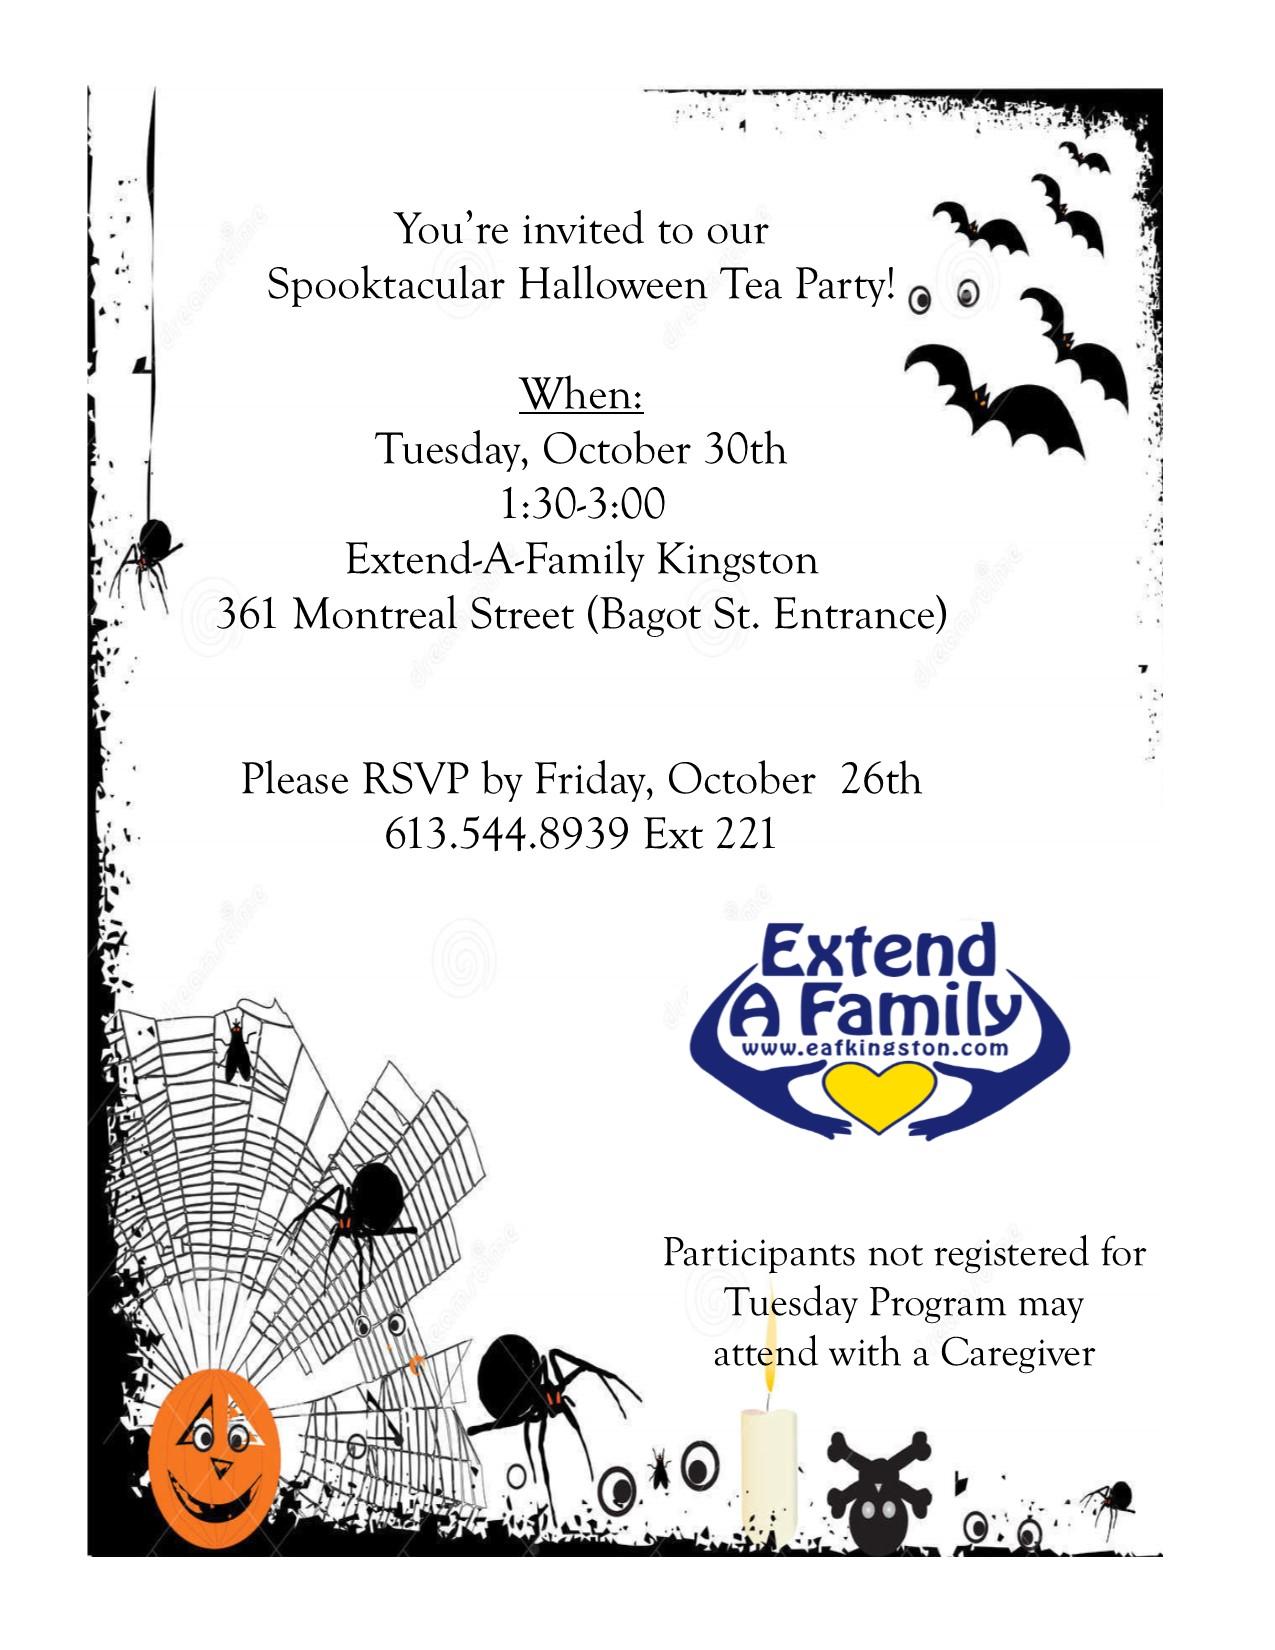 AP Halloween Tea Party Invite 09.21.2018.jpg